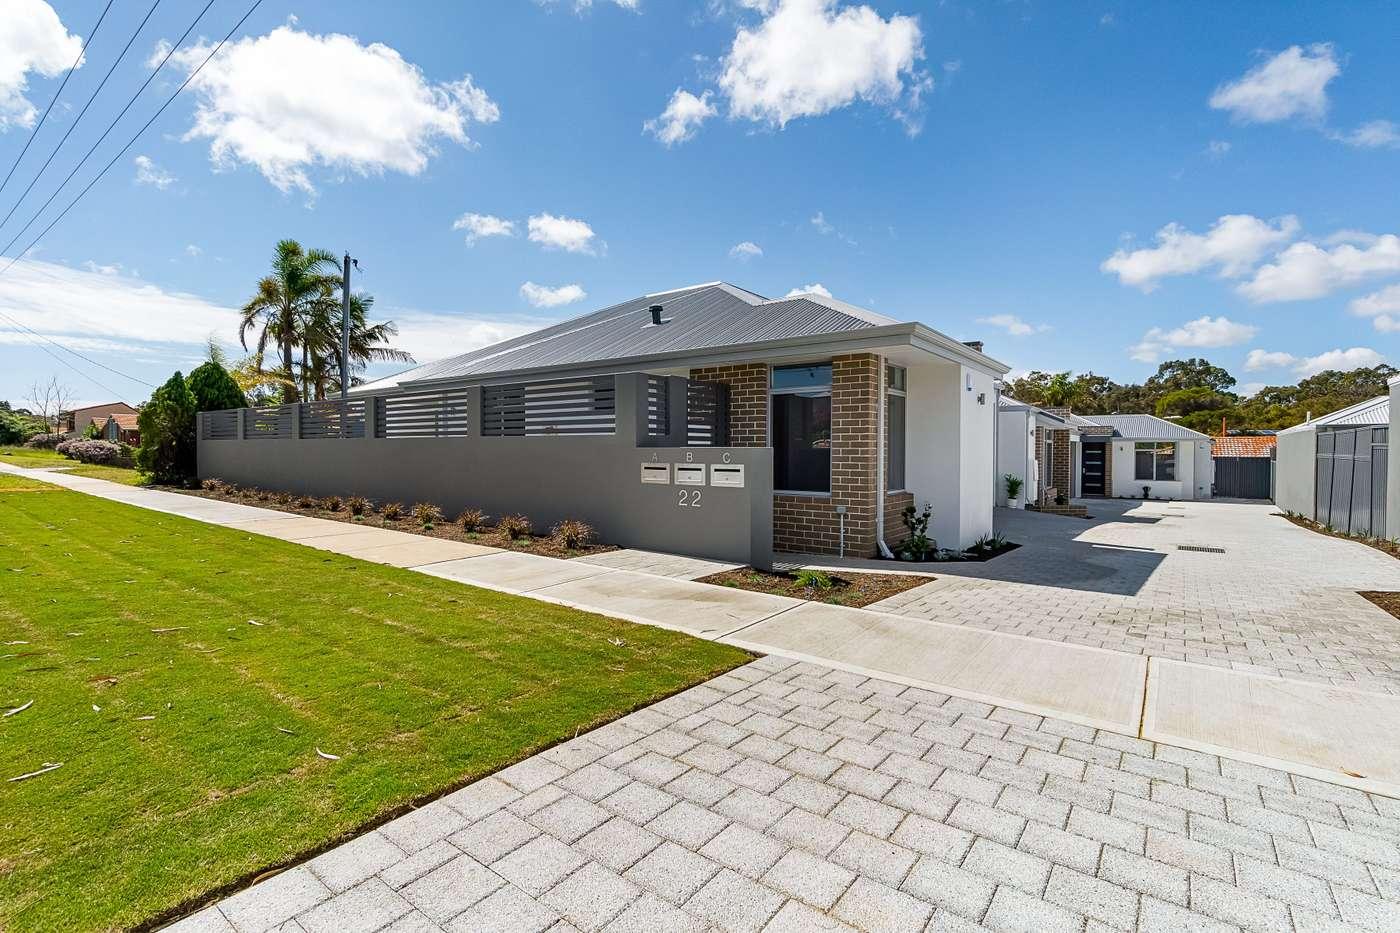 Main view of Homely villa listing, Lot 2, 22 Davallia Road, Duncraig, WA 6023